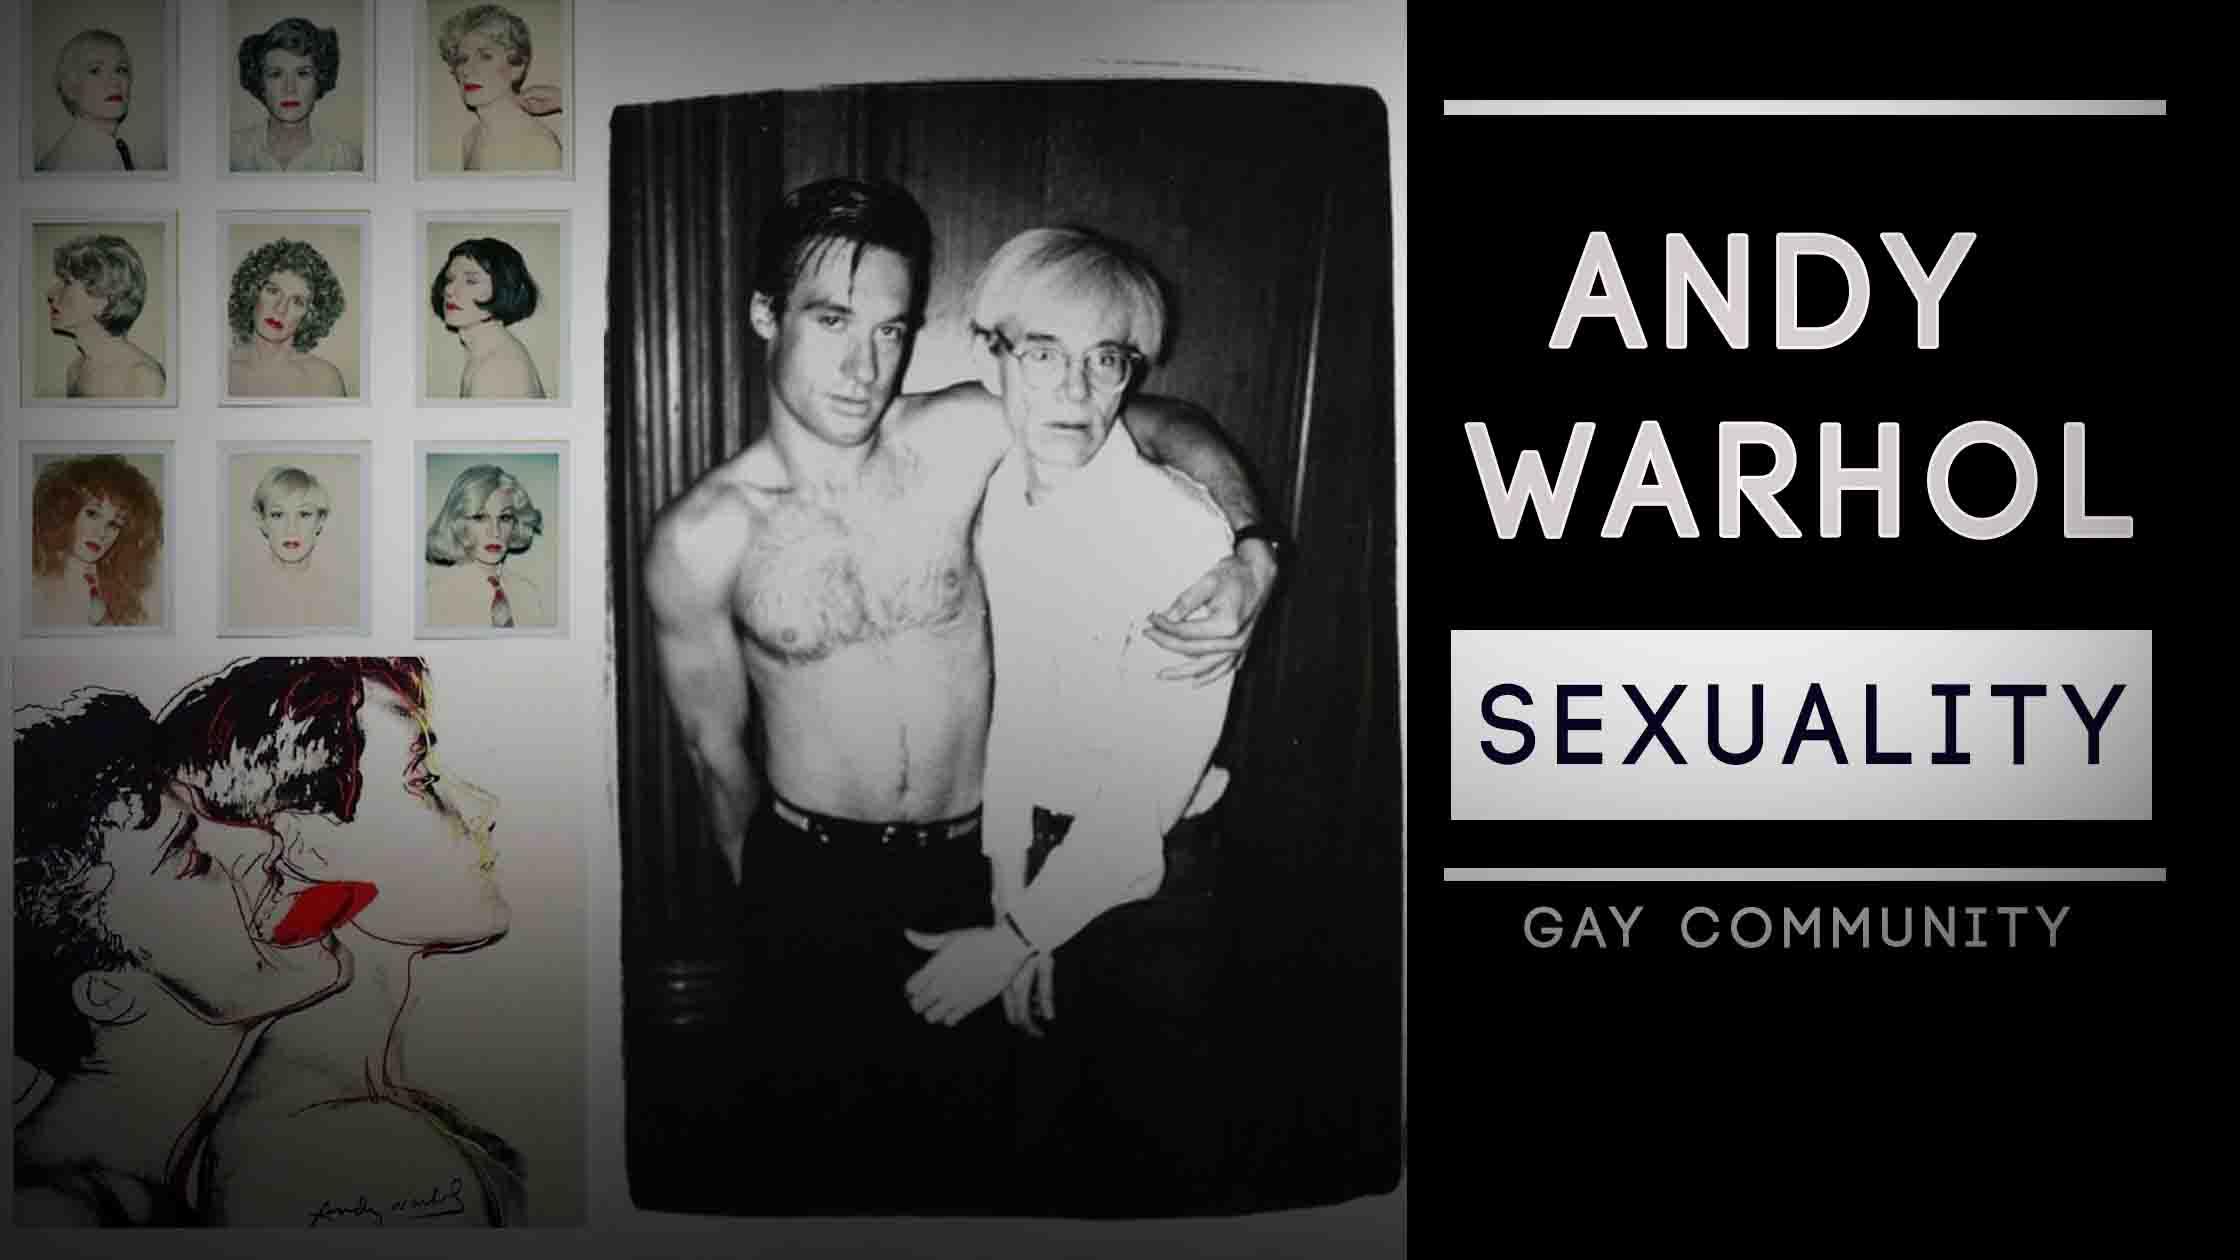 Andy Warhol Sexuality – Contribution to gay, lesbian cummunity